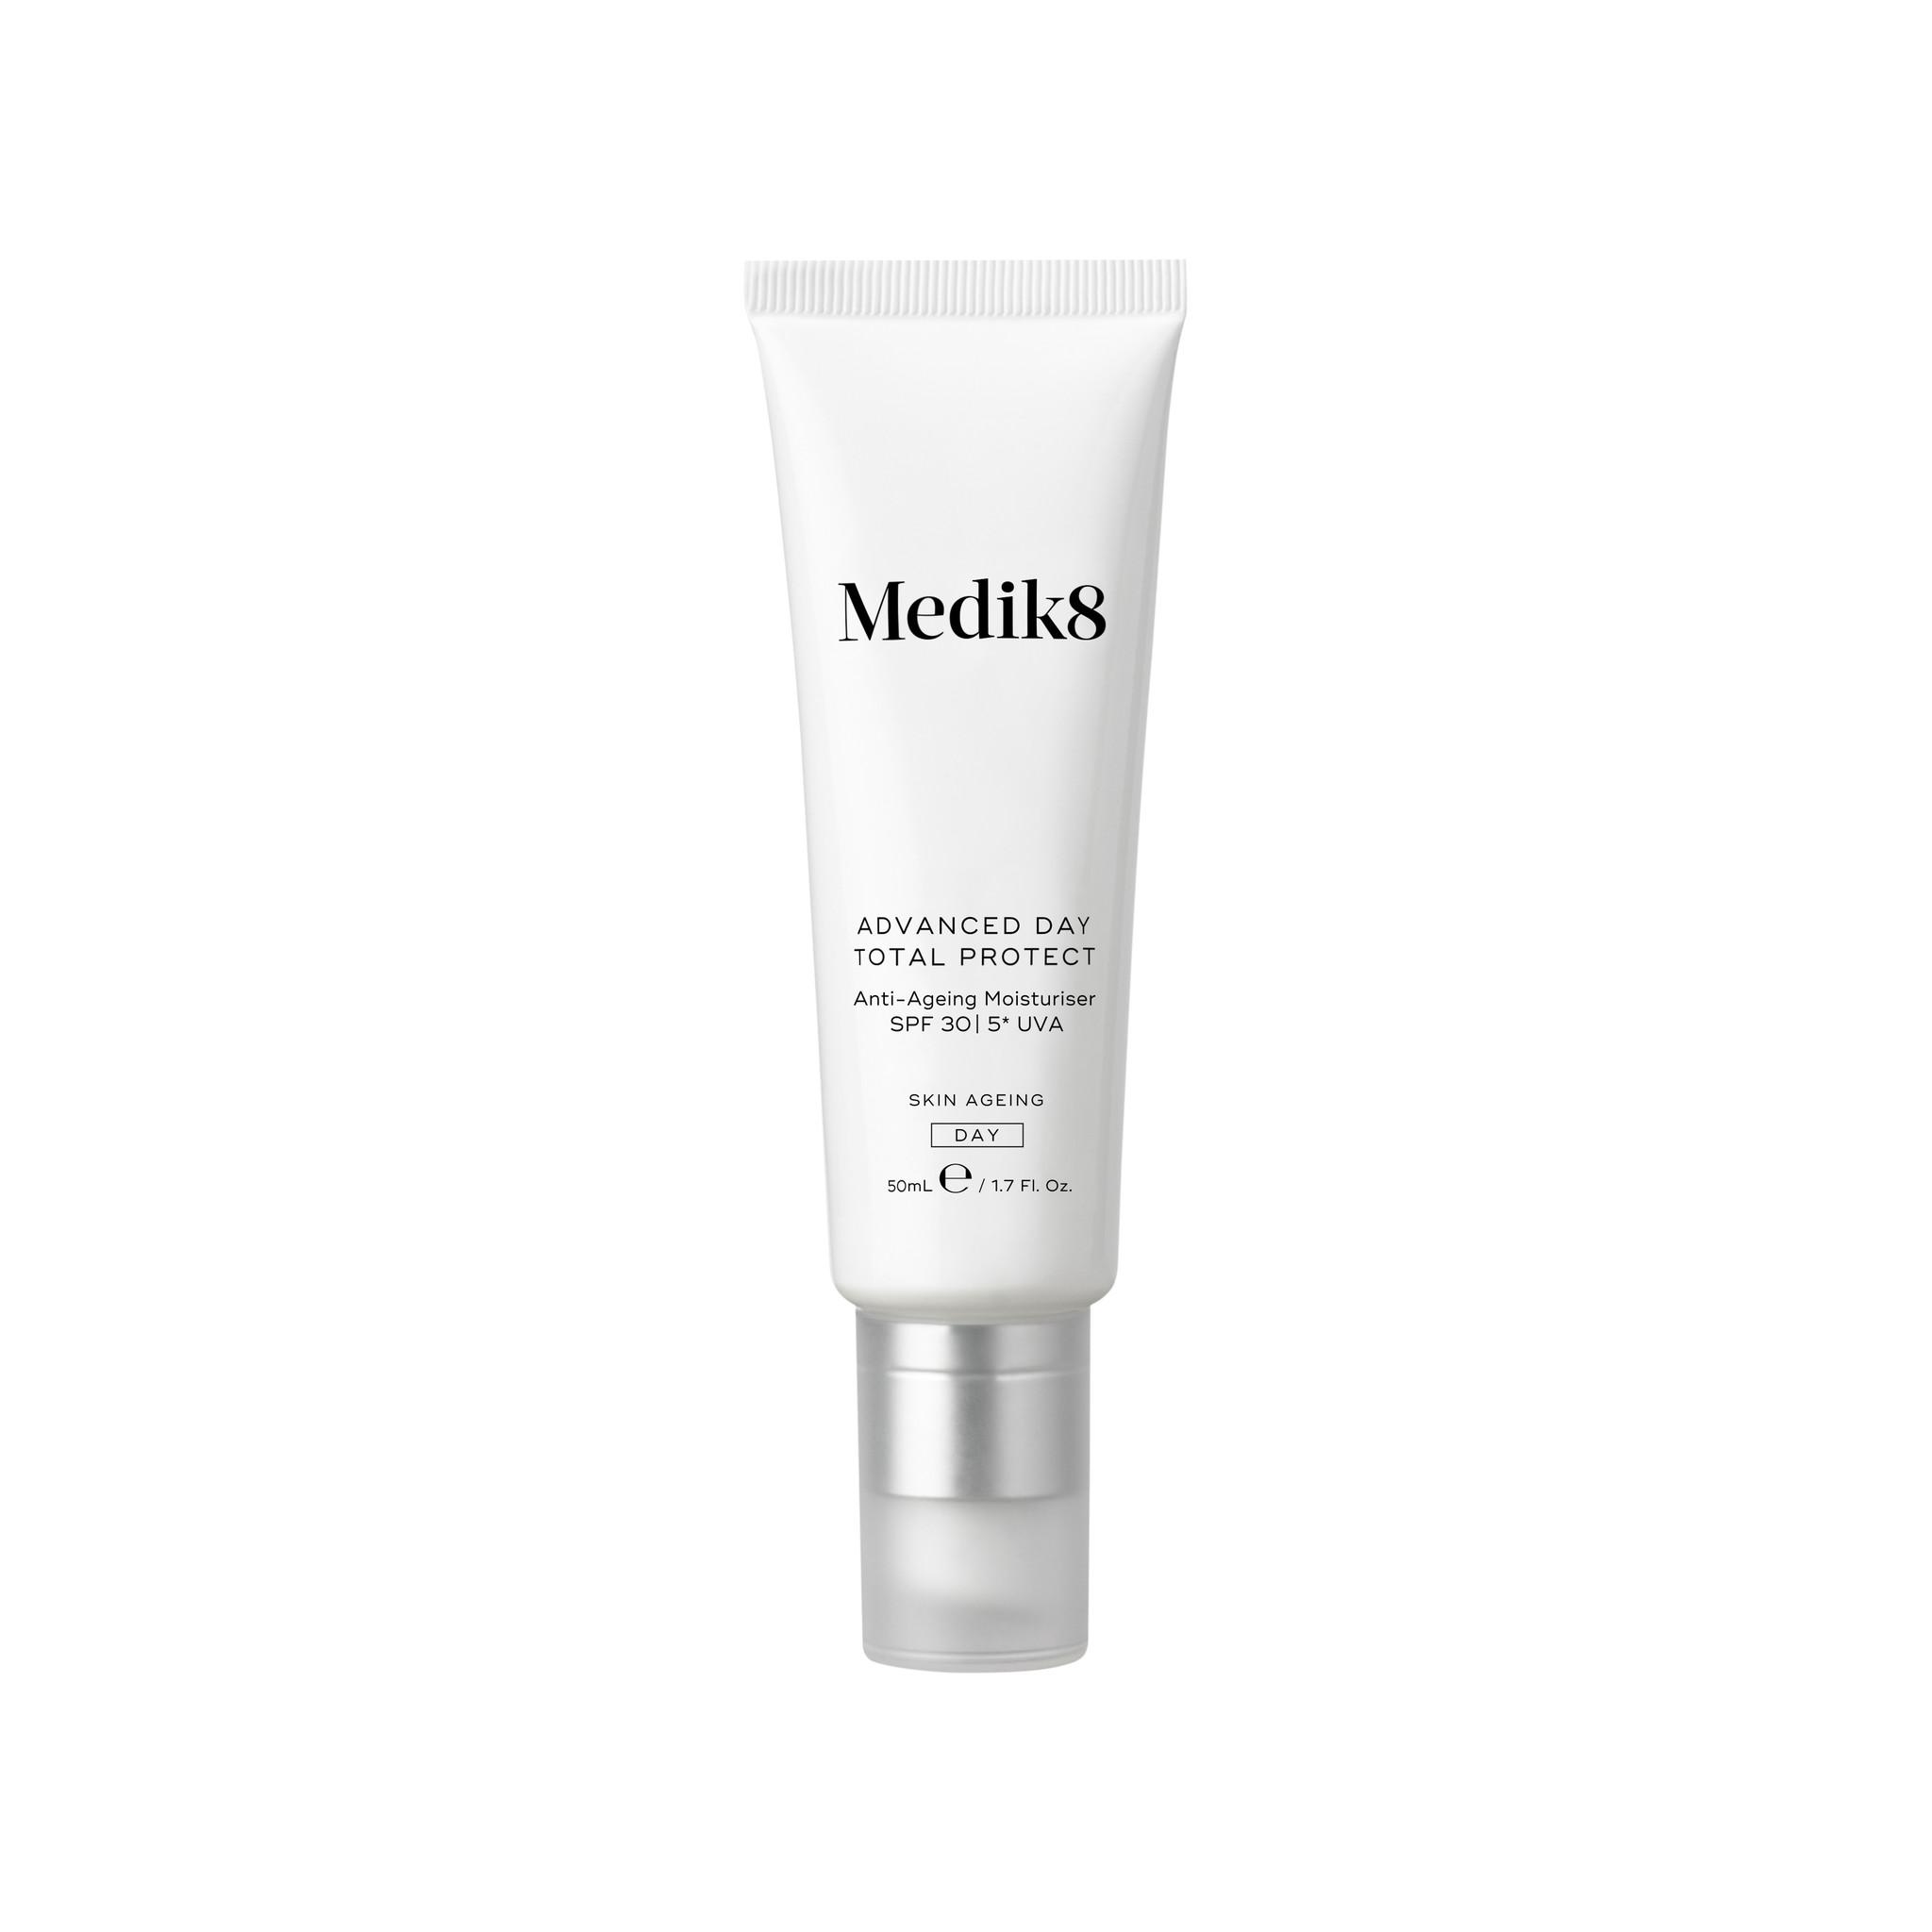 Medik8 Medik8 Dagcrème Advanced Day Total Protect (Hydr8 Day 360) SPF 30 50 ml